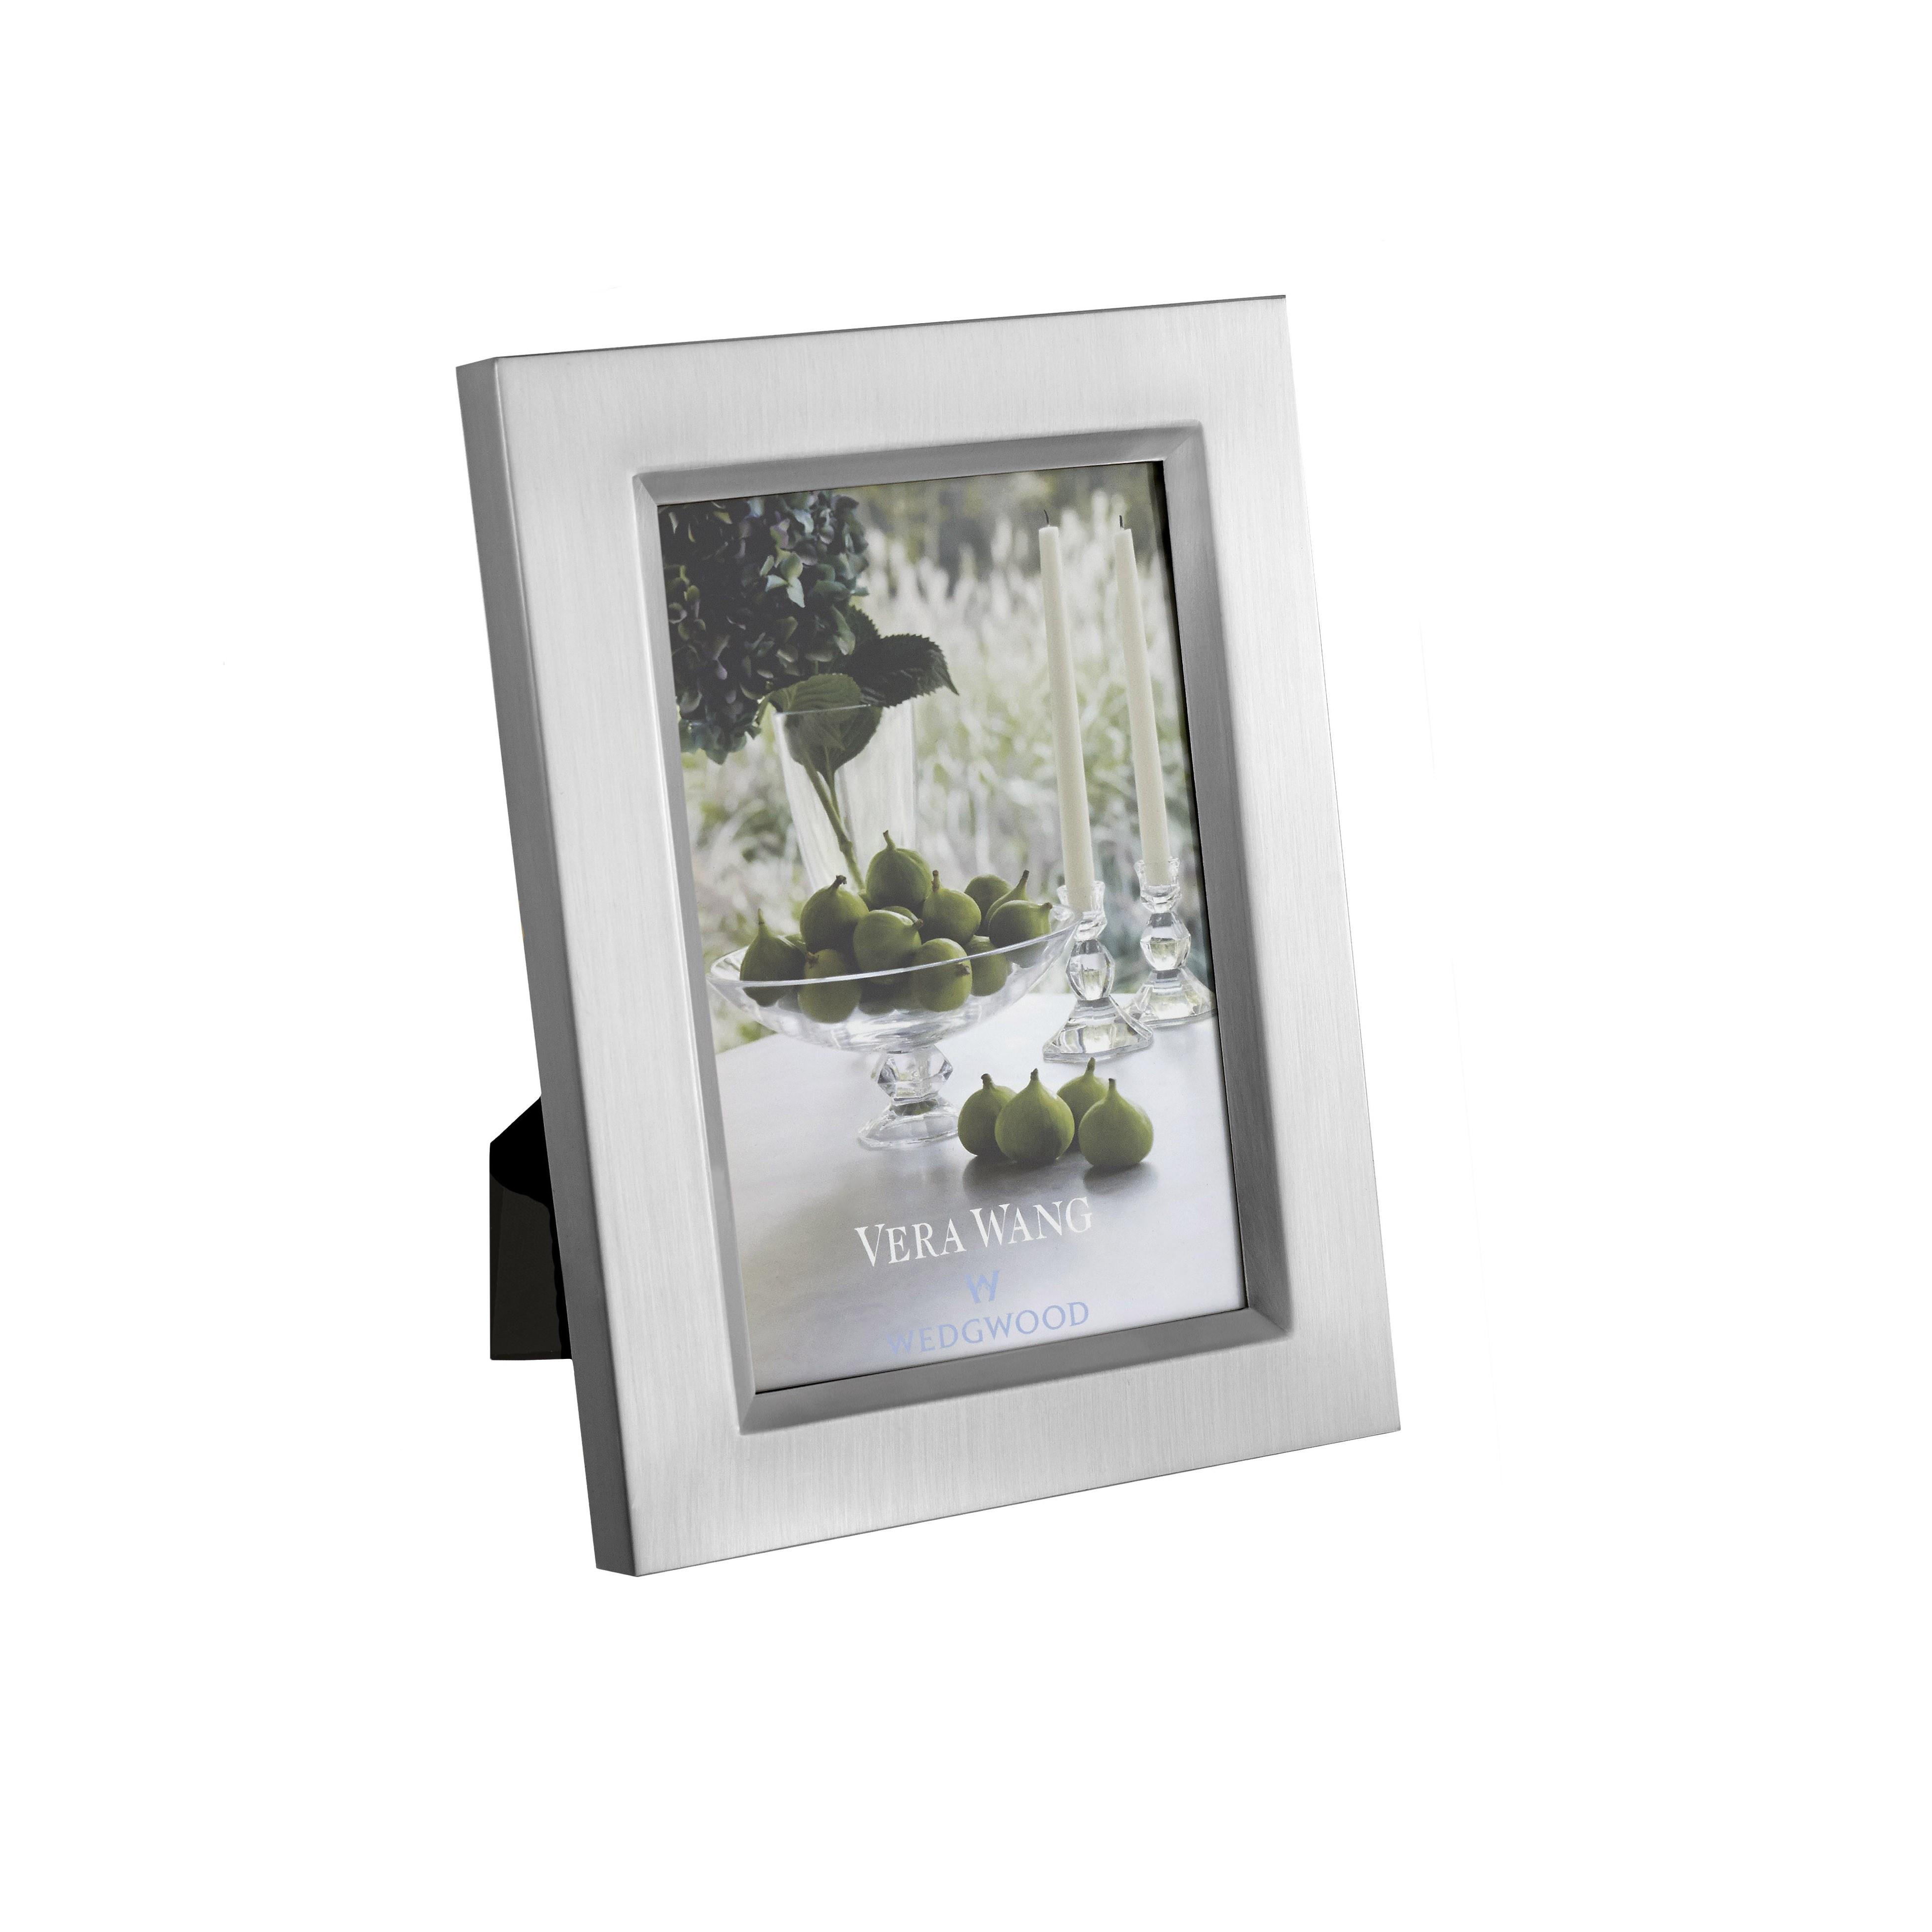 "Vera Wang Wedgwood Wedgwood  Satin Silver Frame 4"" x 6"" (10 x 15cm)"